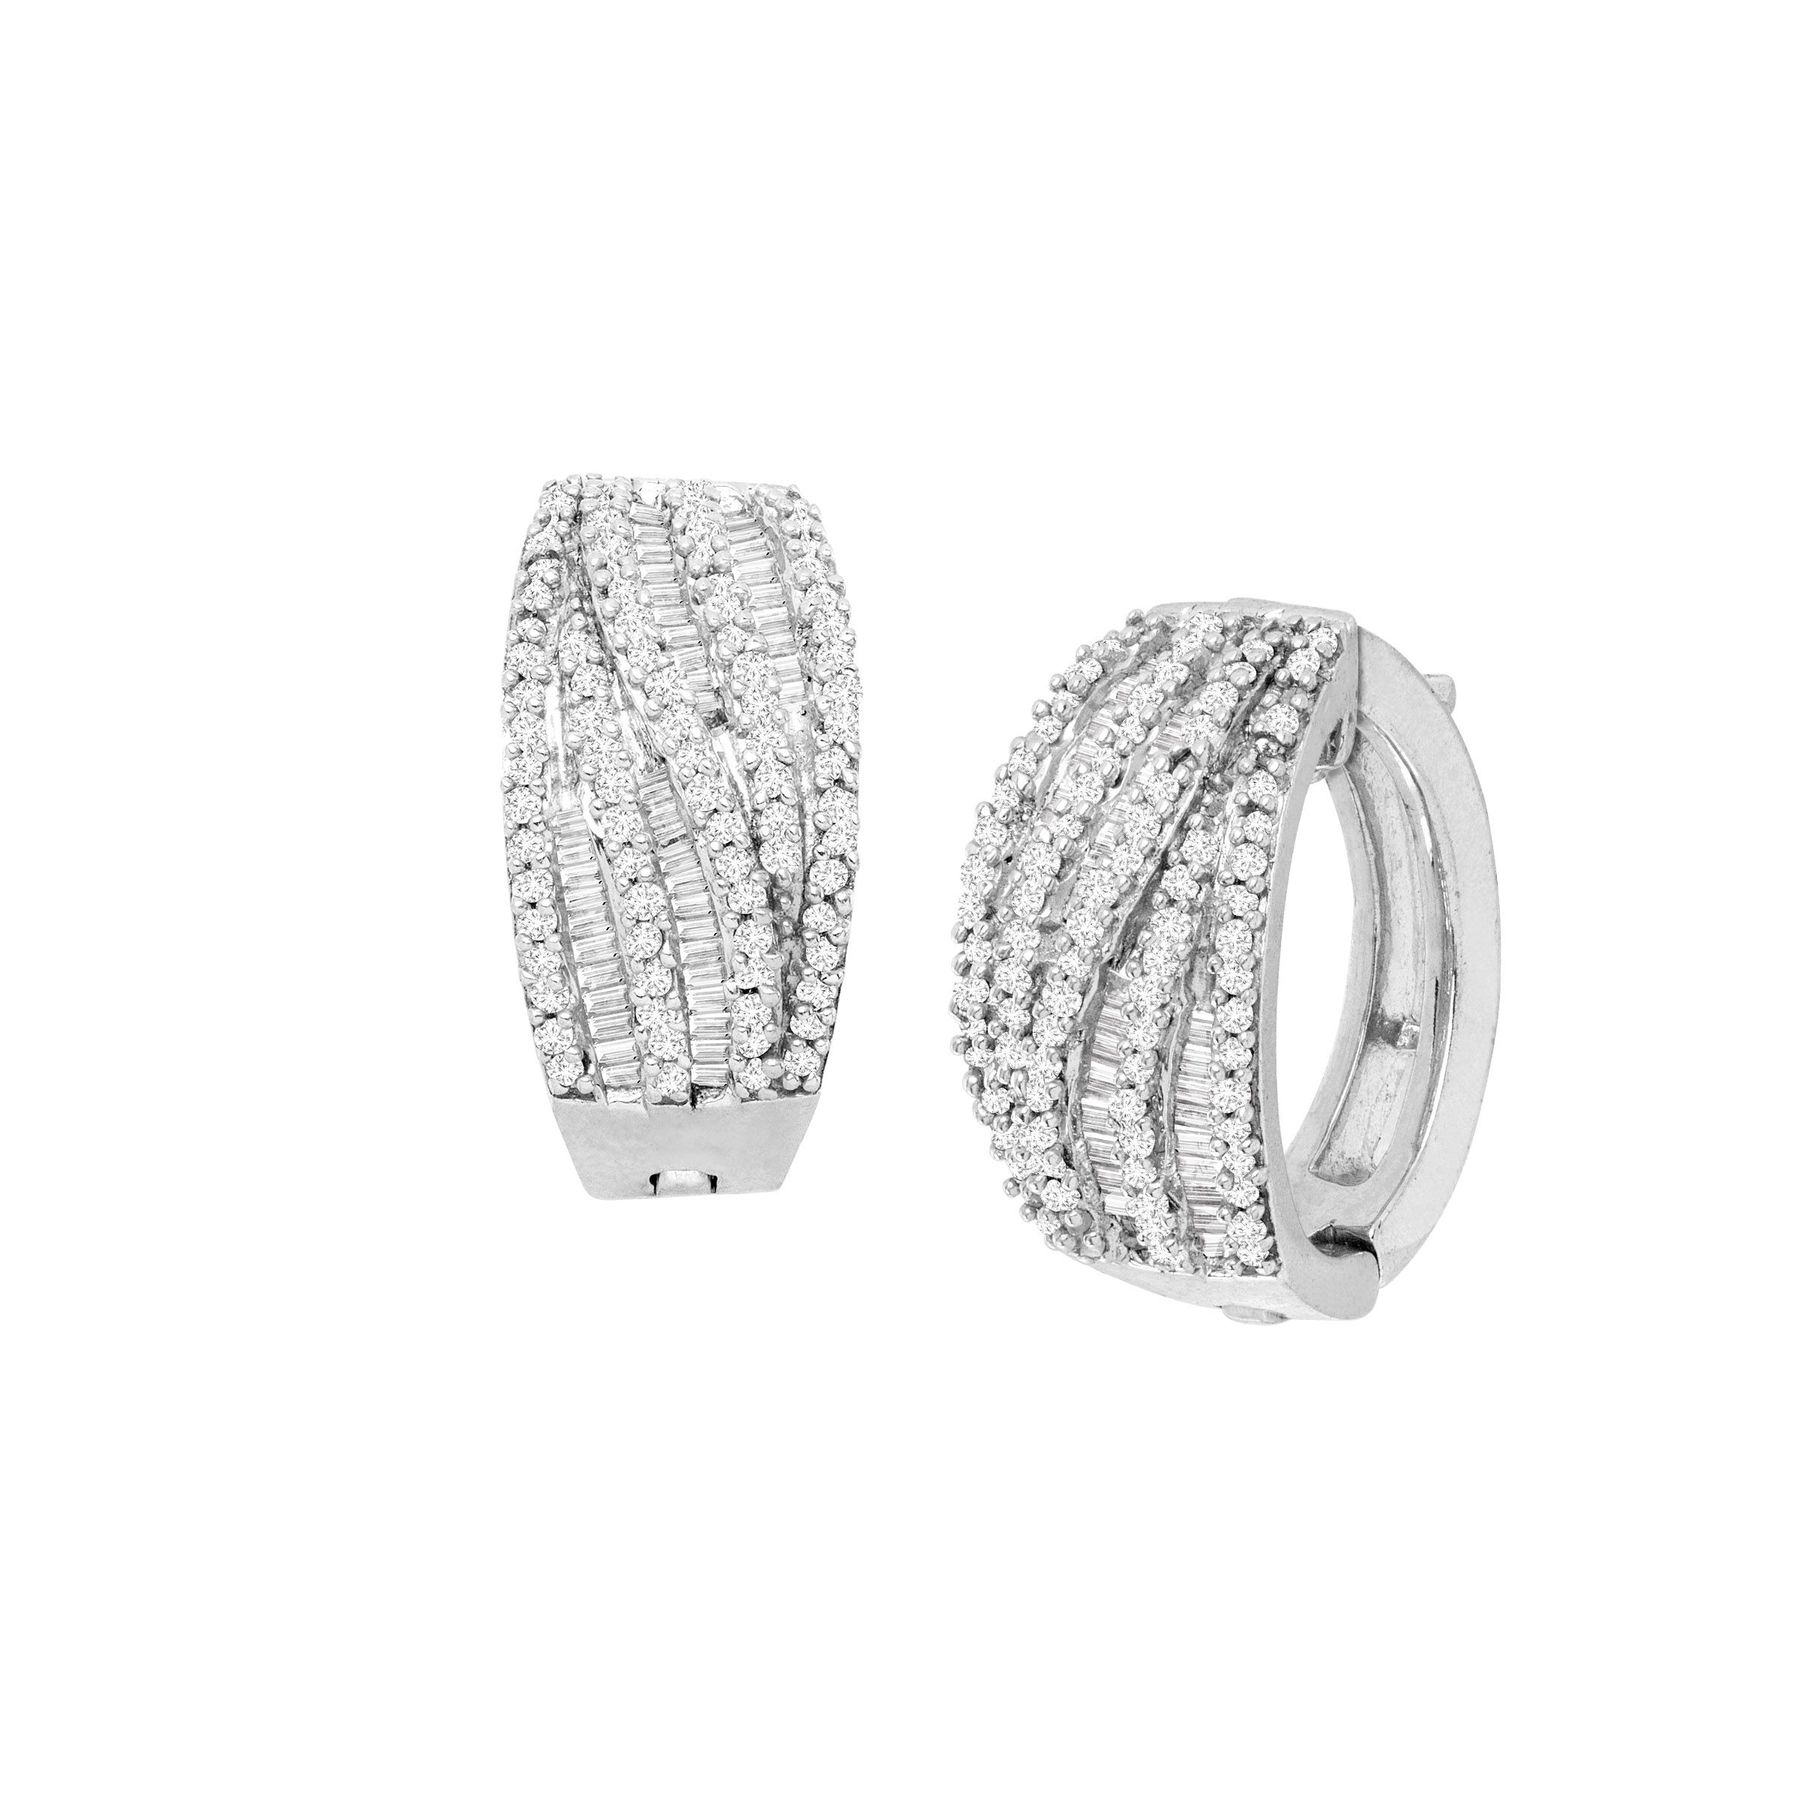 1 Ct Diamond Wide Hoop Earrings In 14k White Gold